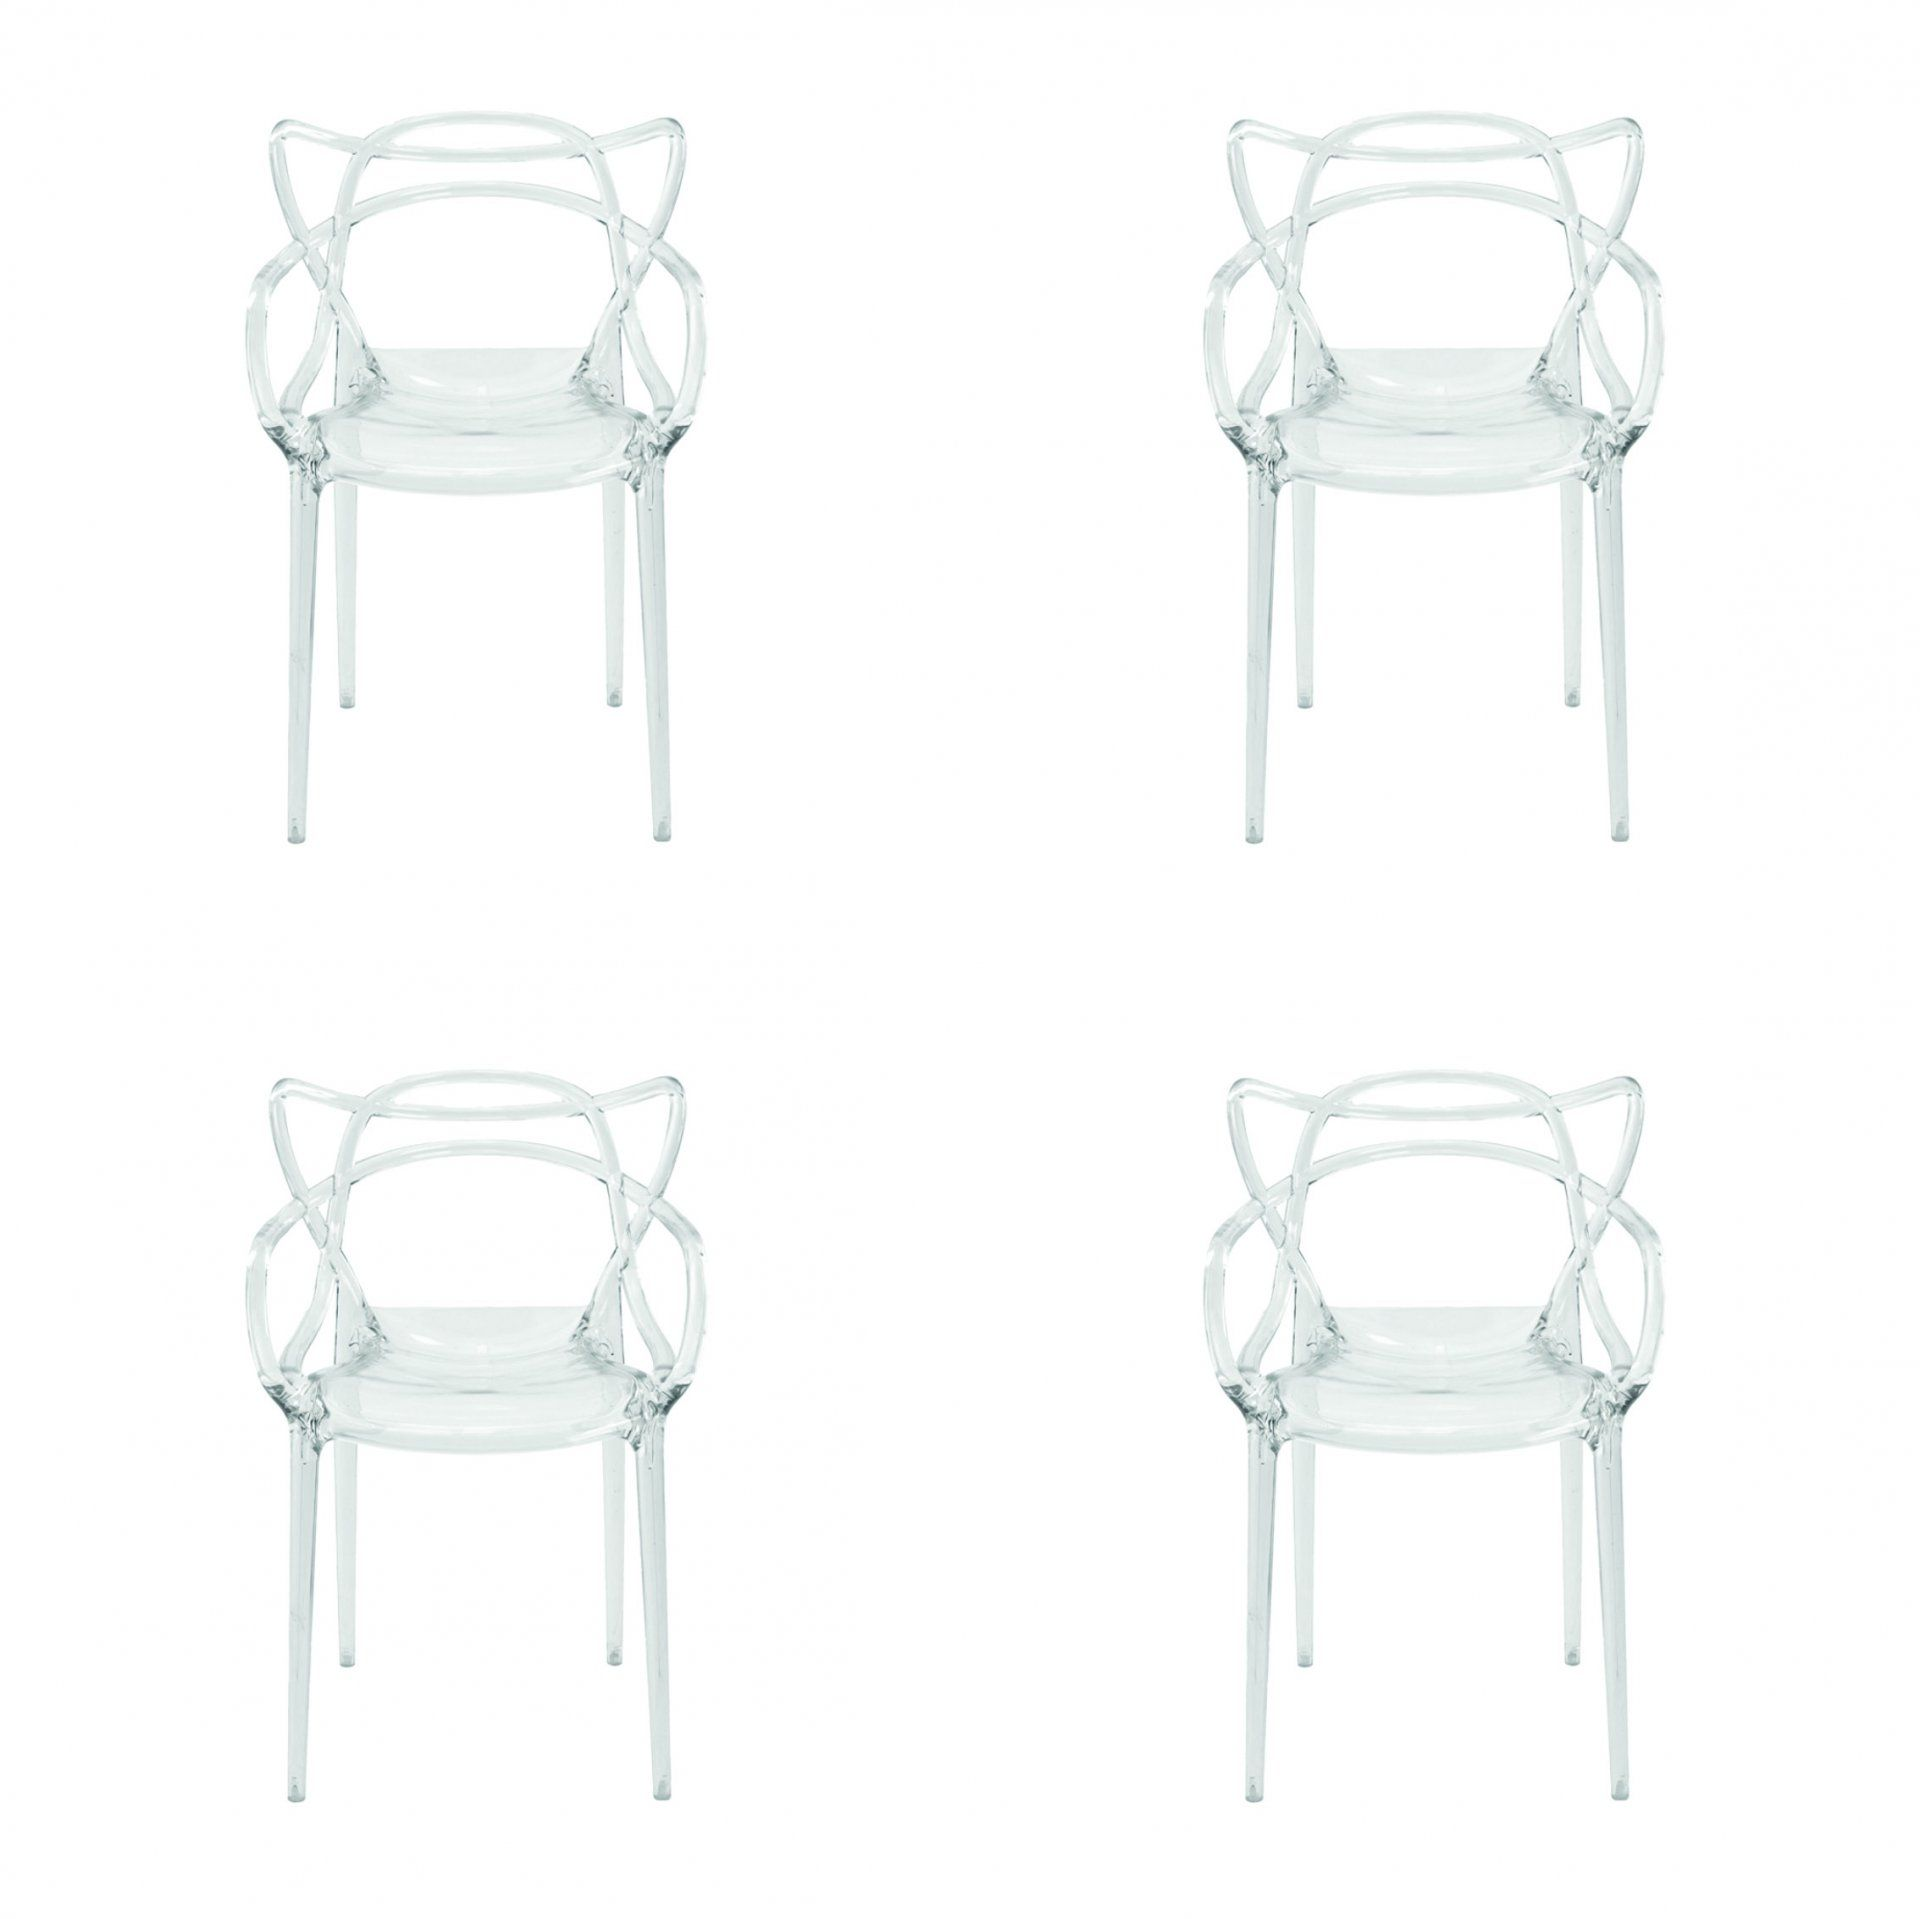 conjunto-4-pecas-cadeira-allegra-masters-de-policarbonato-rivatti